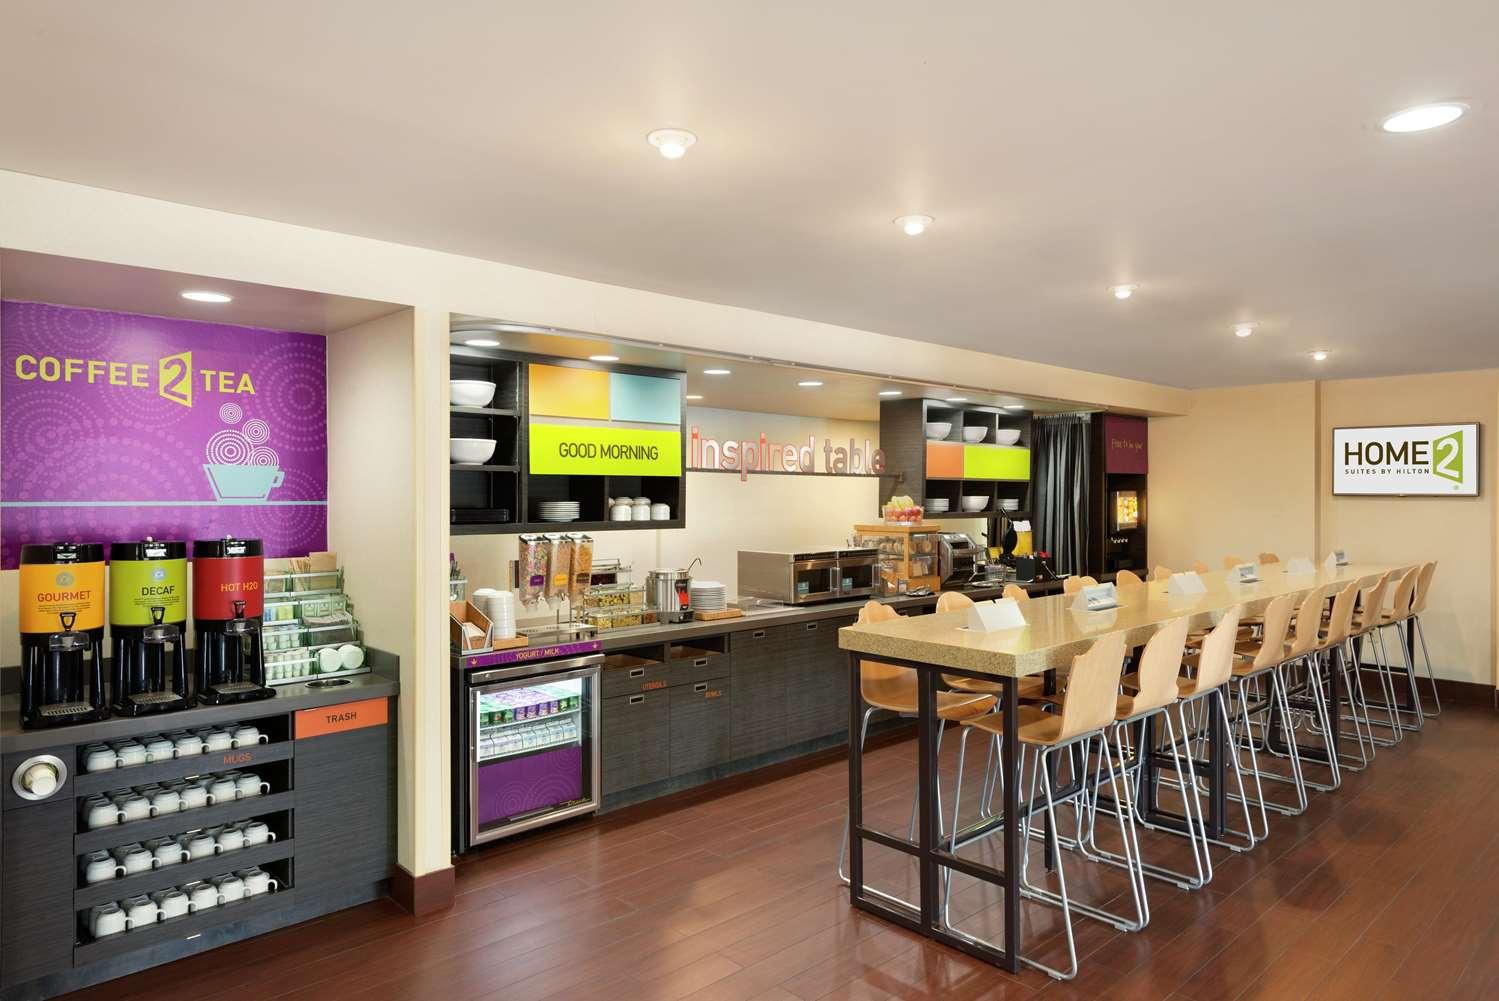 Restaurant - Home2 Suites Florida City